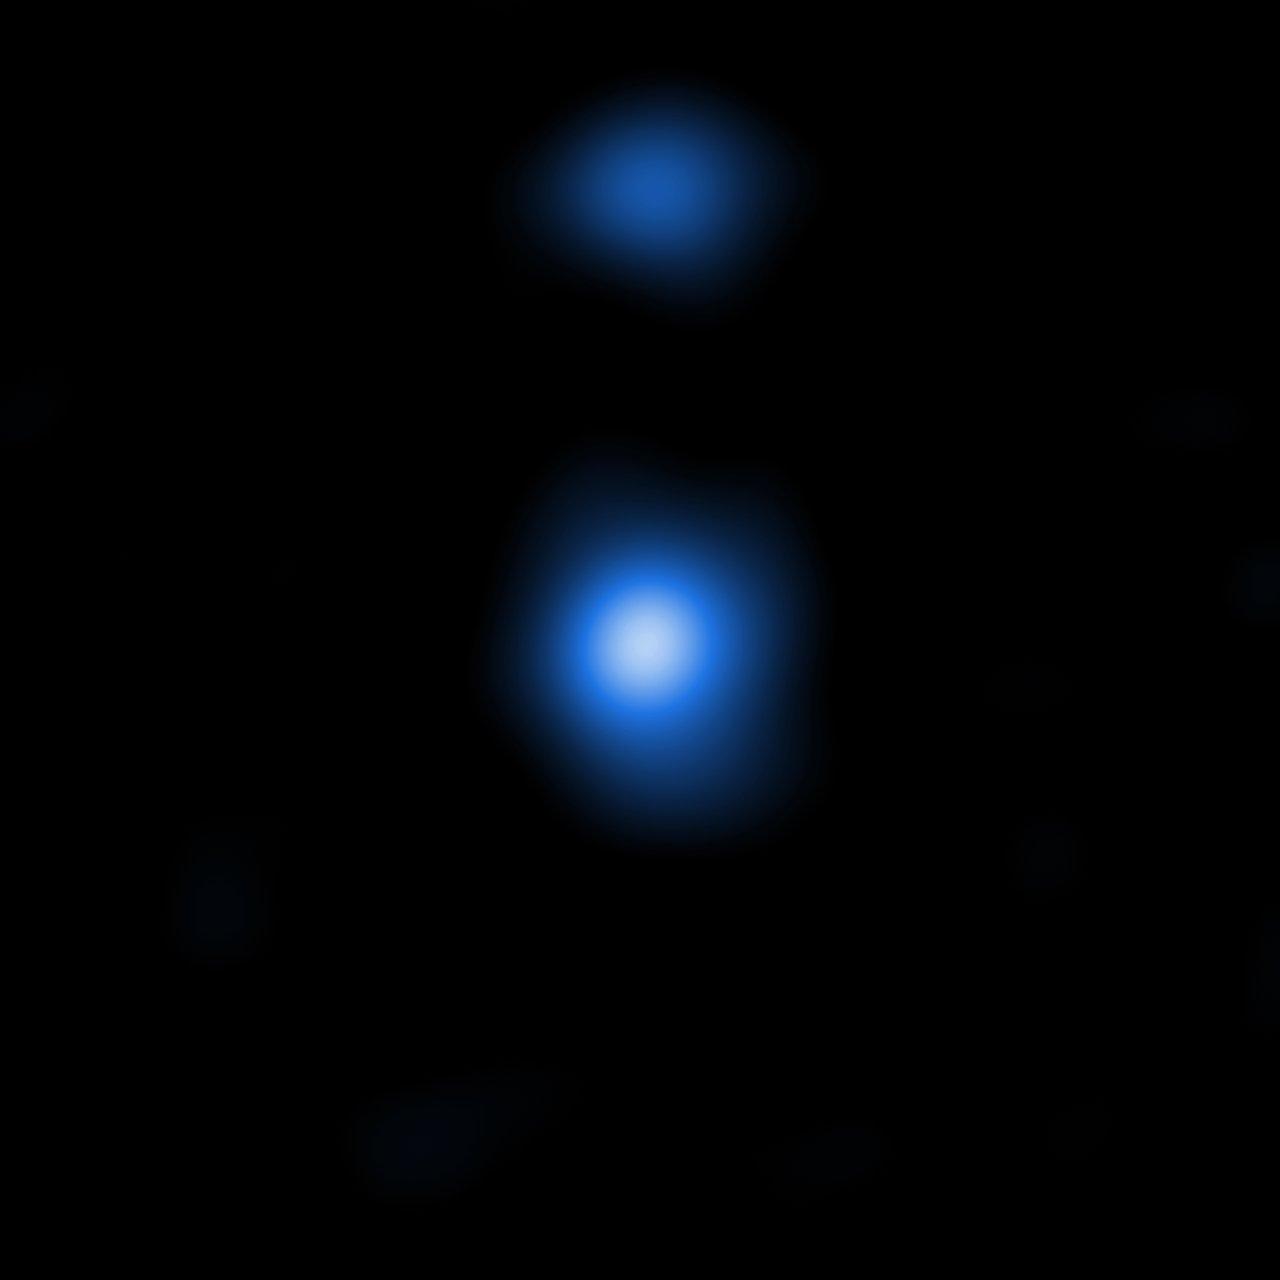 Supermassive black hole seed seen by Chandra | ESA/Hubble